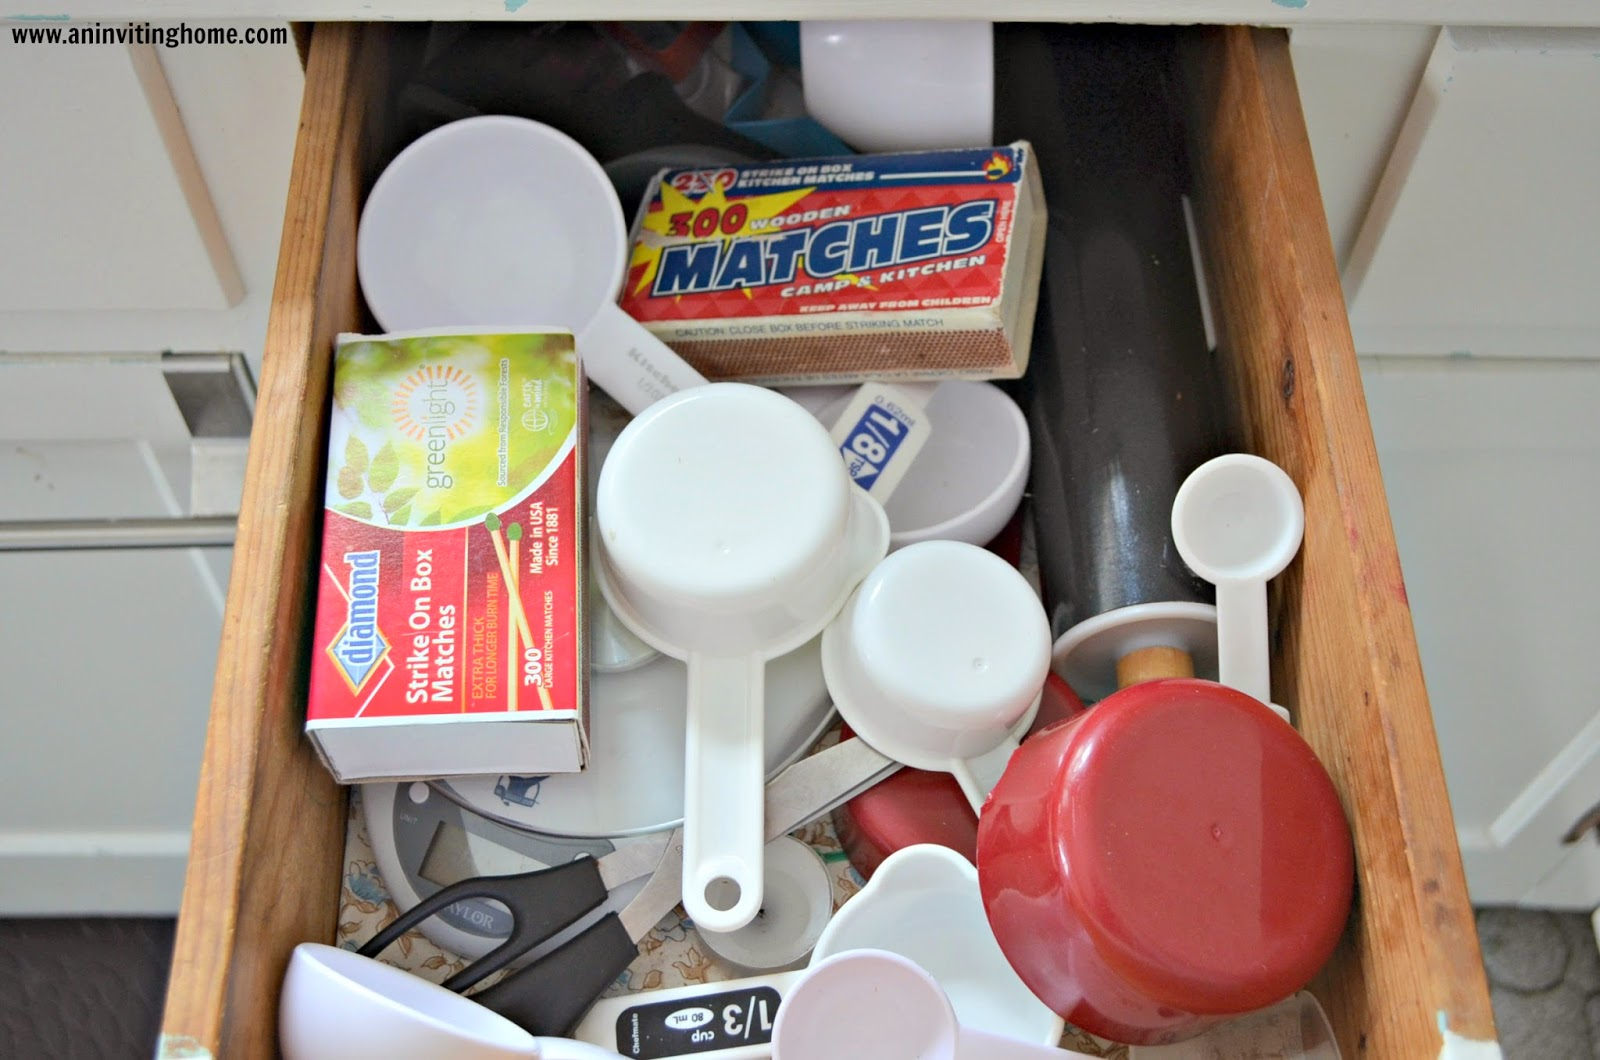 a messy kitchen drawers